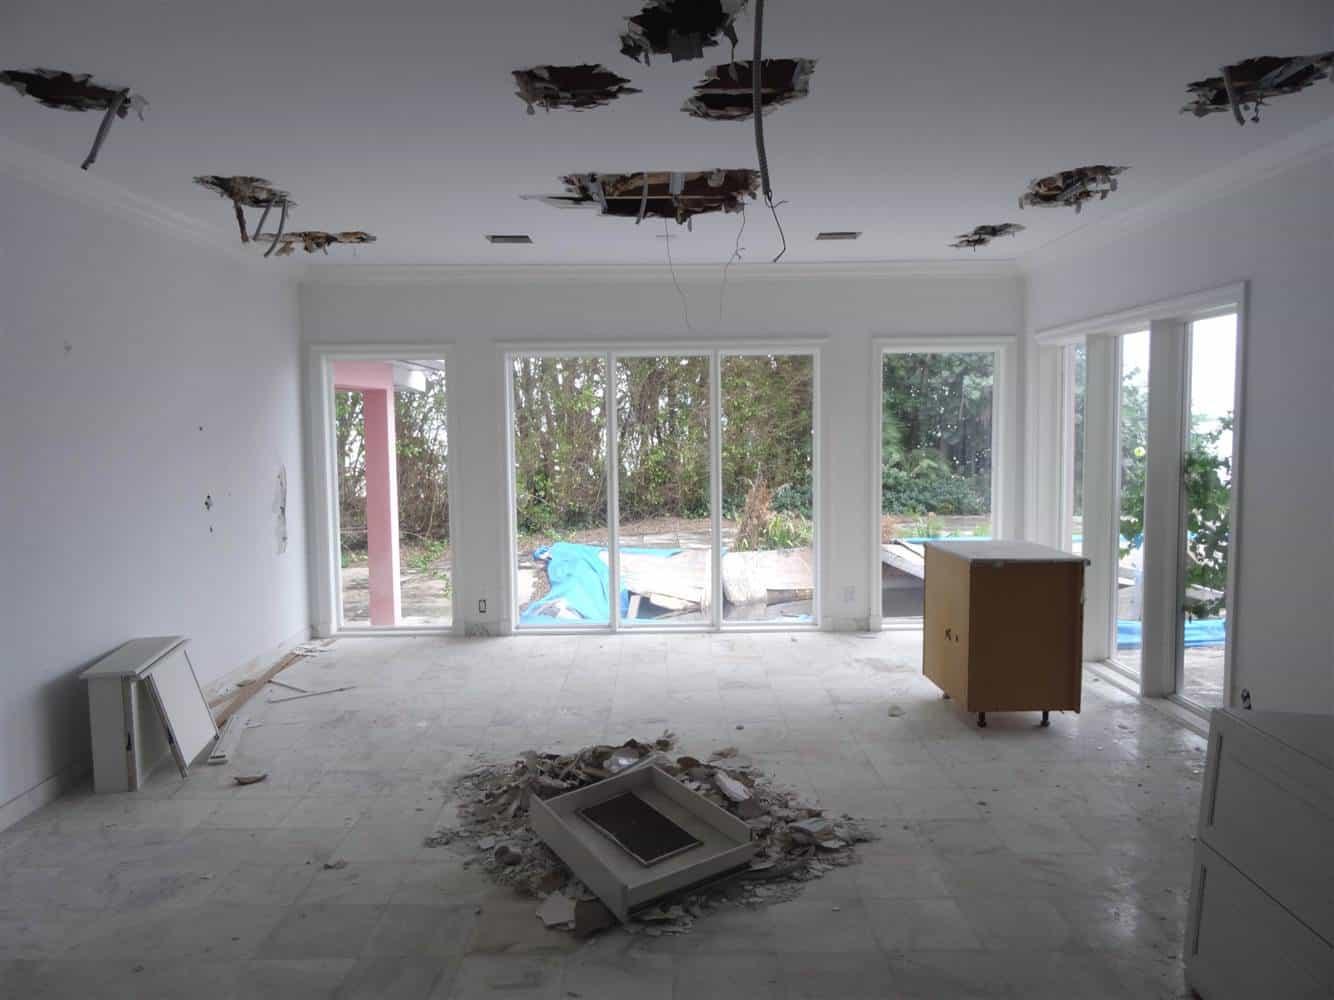 I Hope Netflixu0027s Narcos Covers Pablo Escobaru0027s Miami Beach Mansion Biting  The Dust